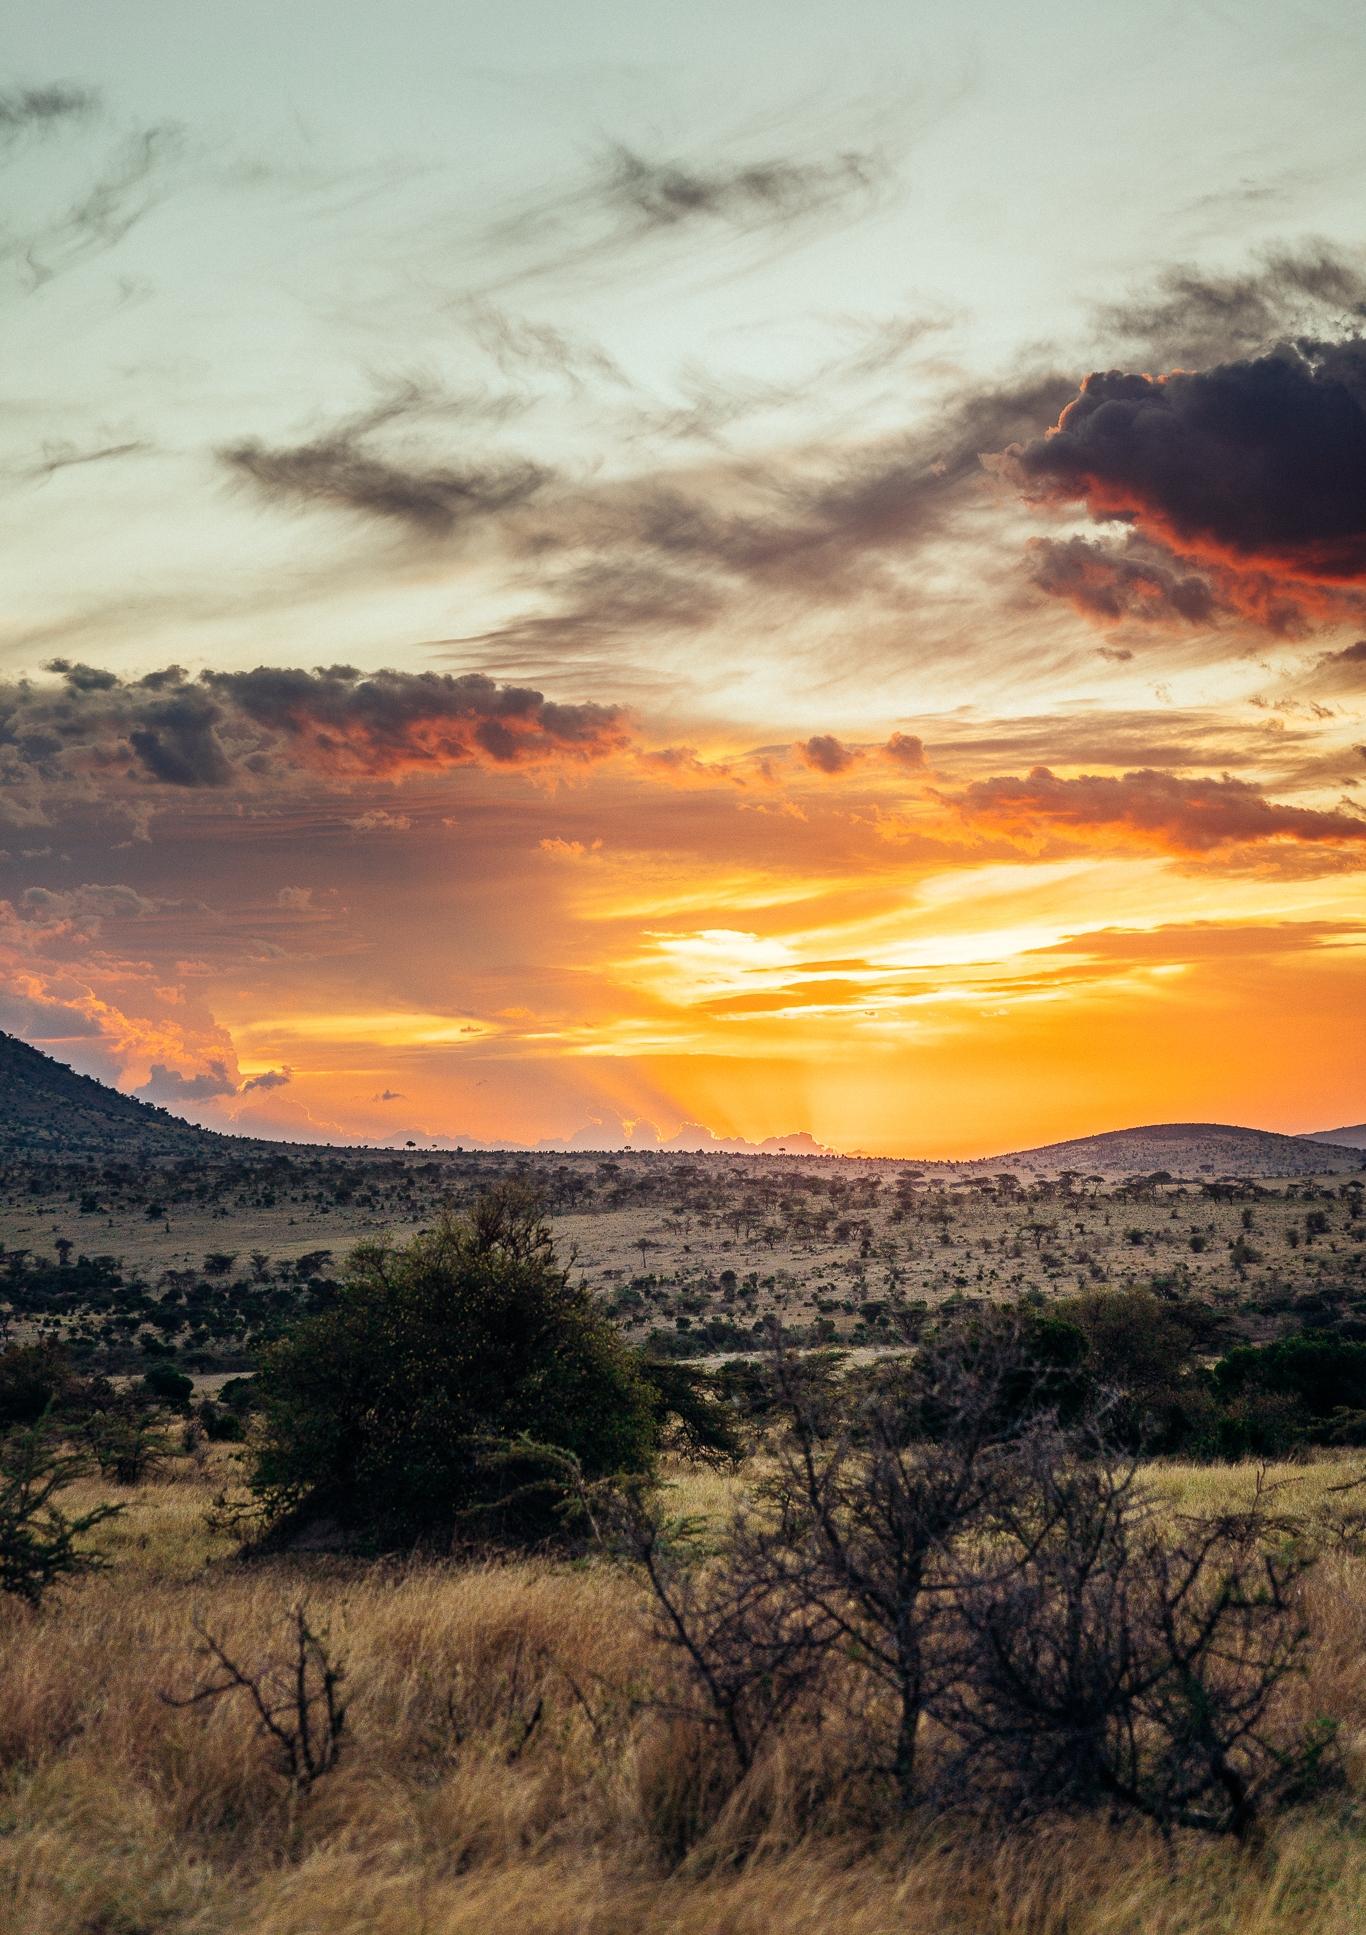 Maasai Mara Sunset Ph. Dave Krugman